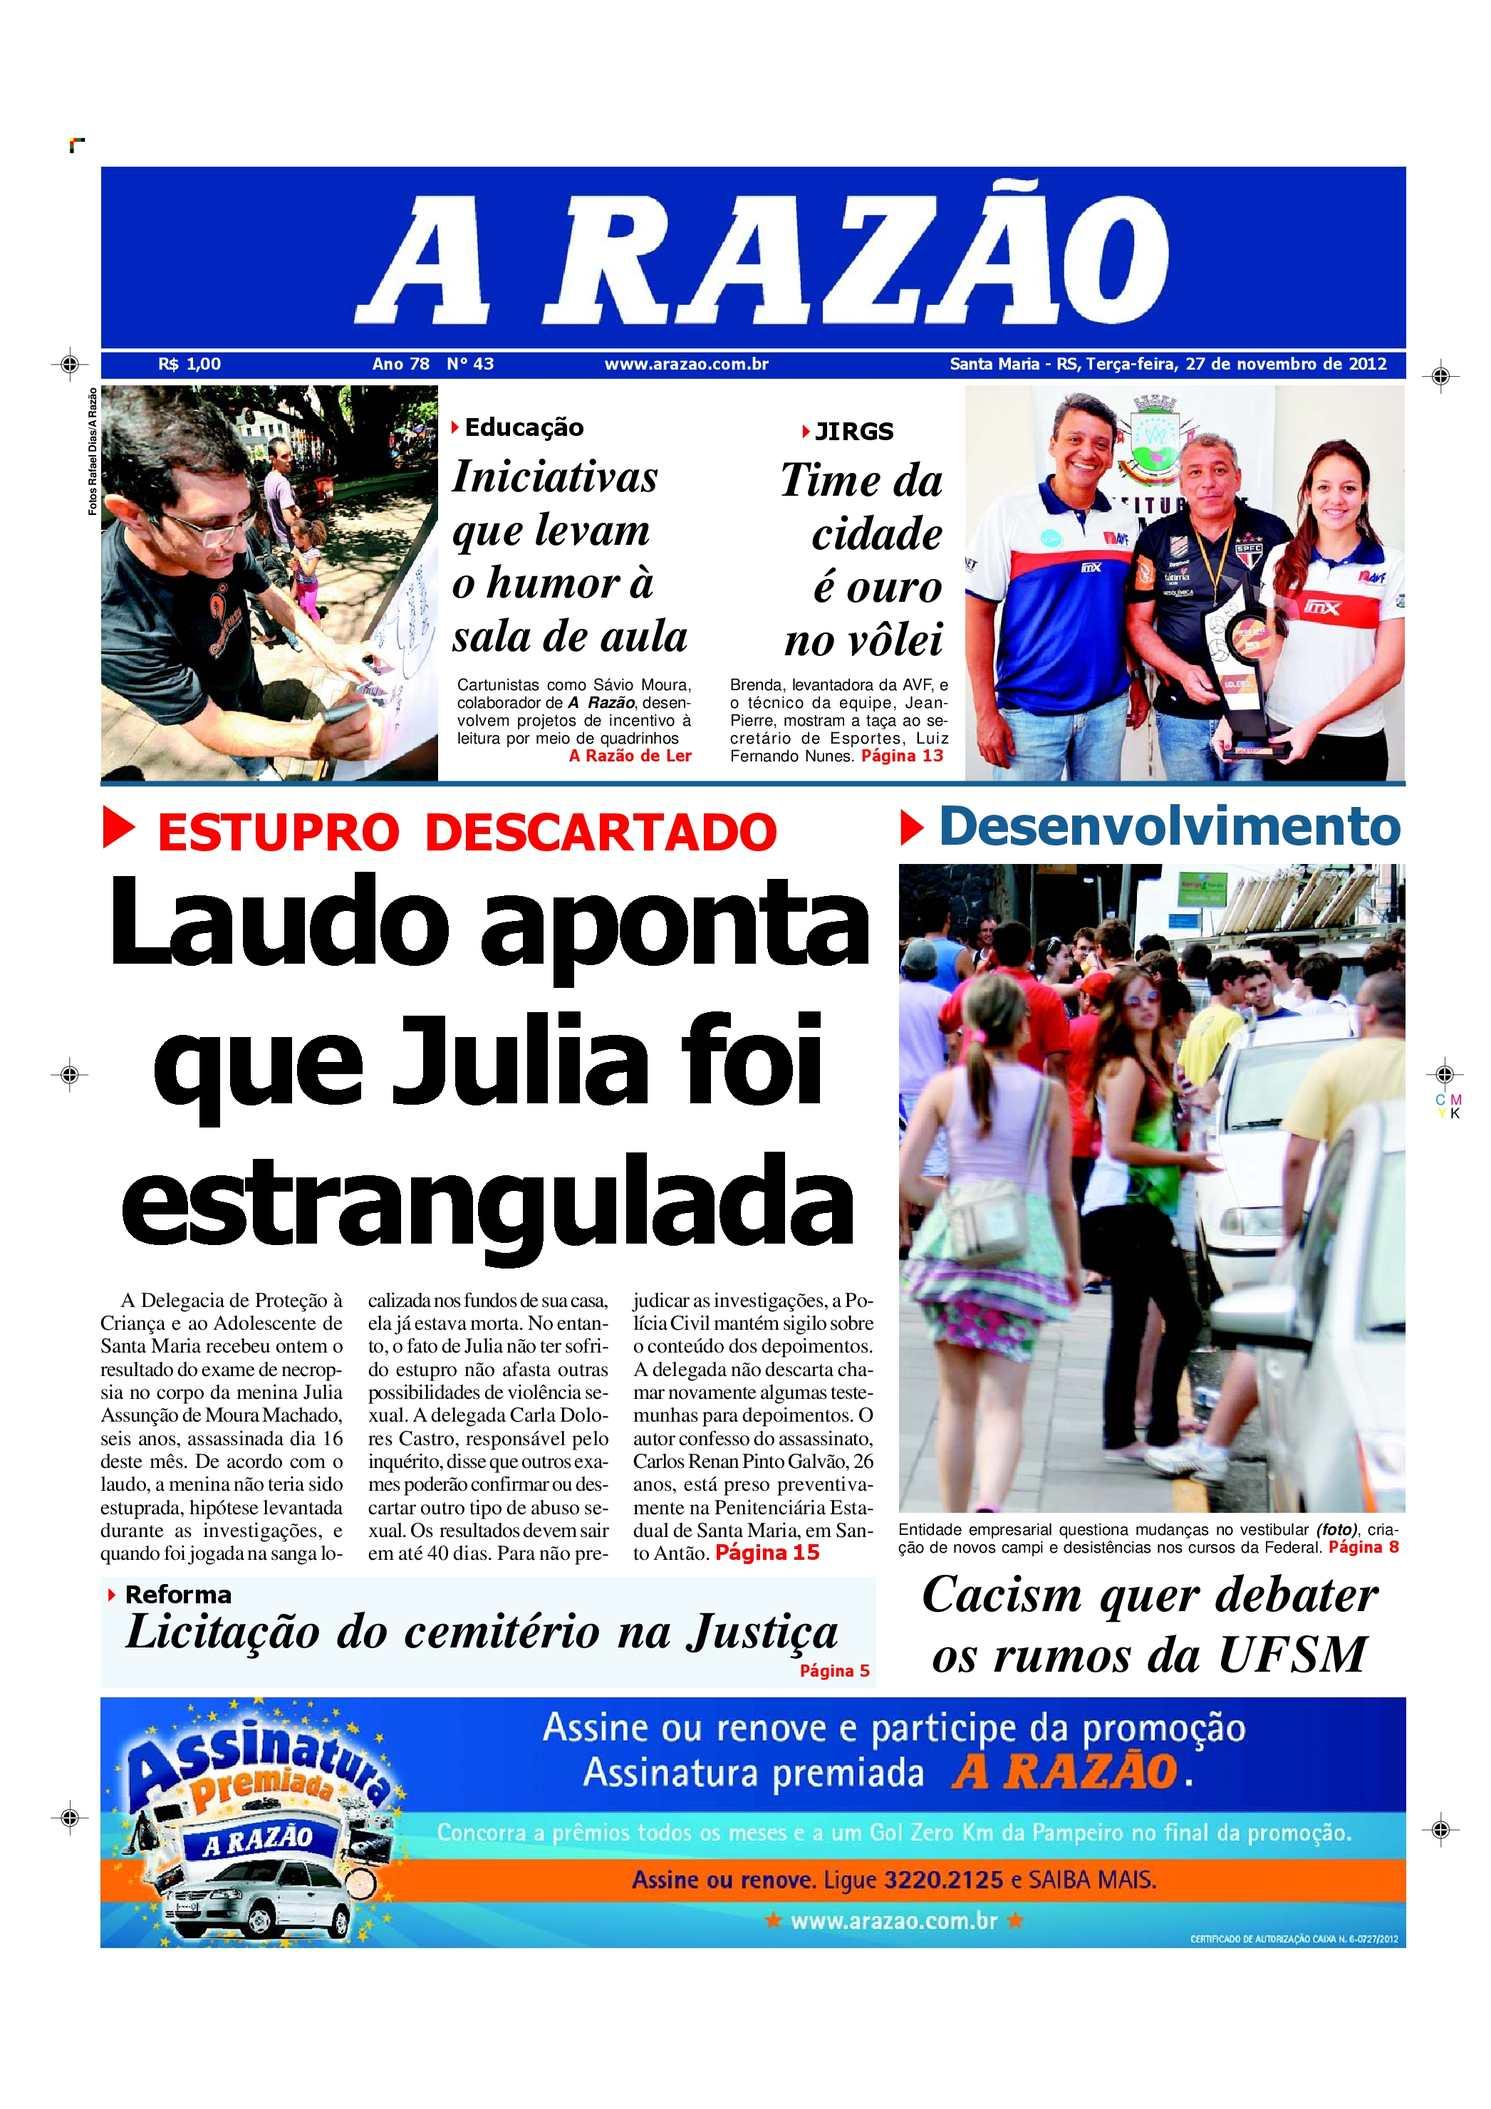 Calaméo - Jornal A Razão Santa Maria - 27112012 019b8a8999